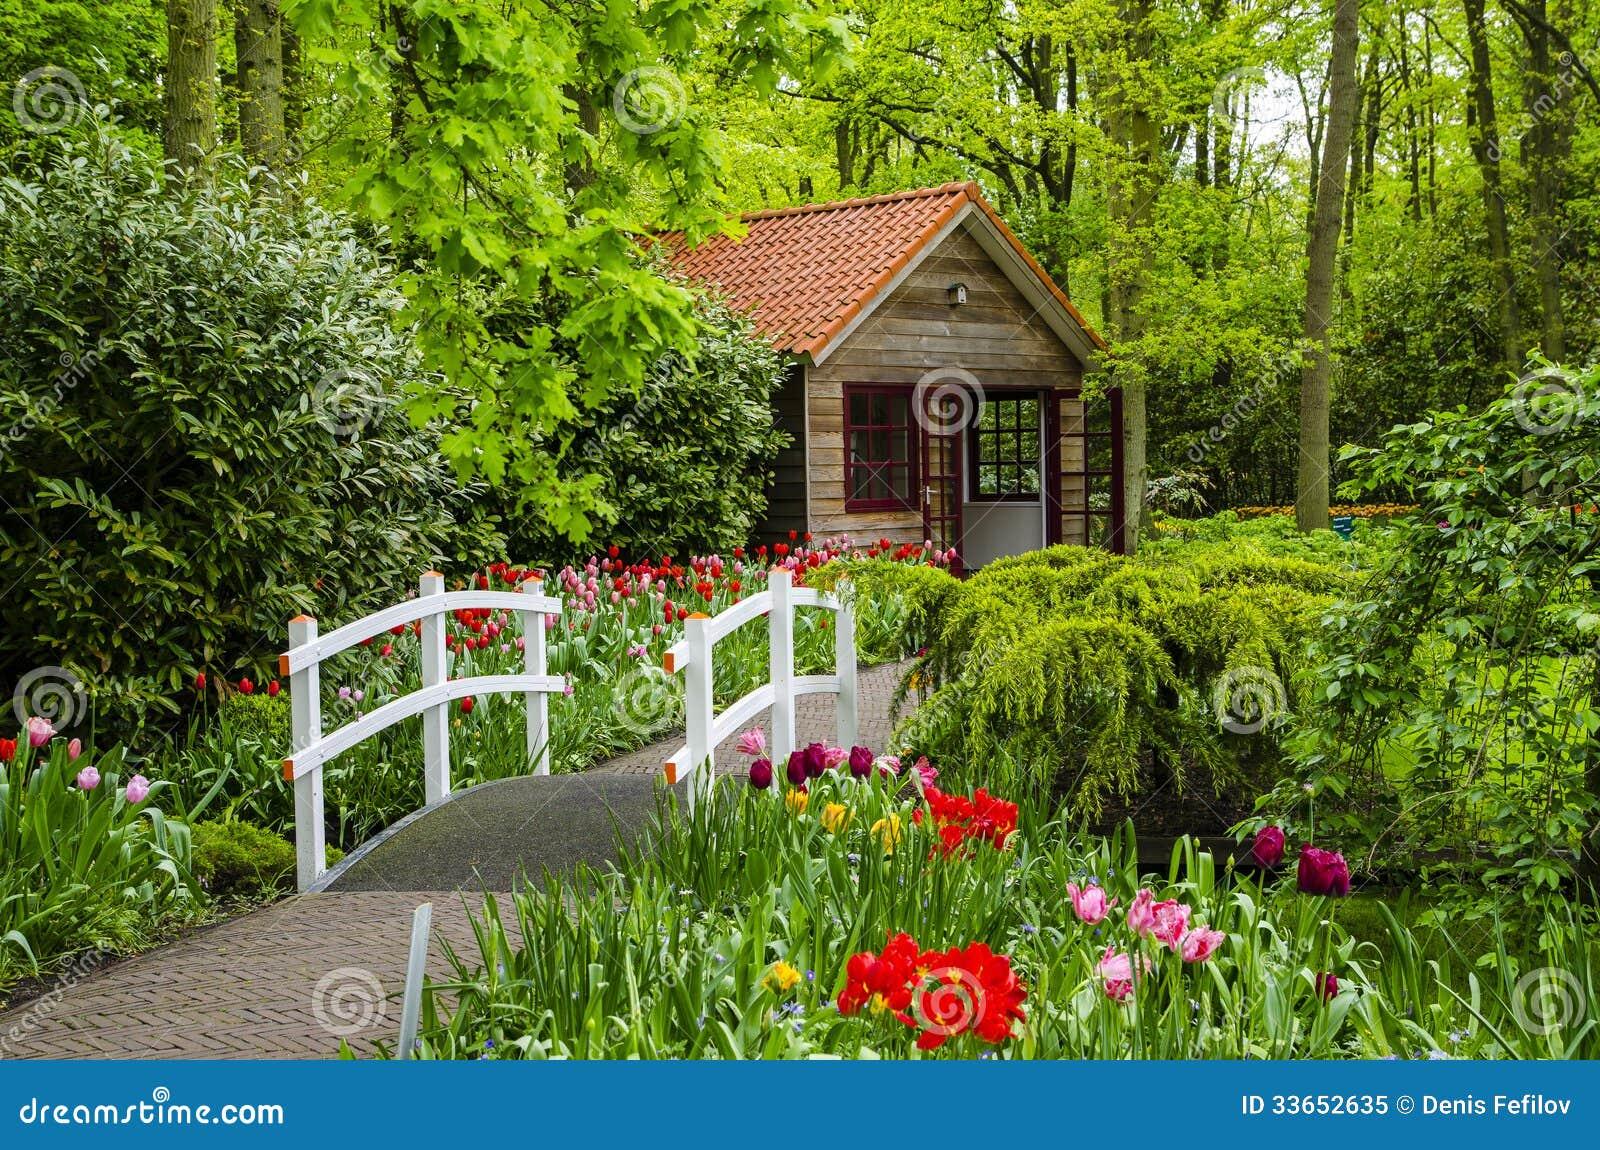 Comprar ofertas platos de ducha muebles sofas spain for Jardines hermosos para casas pequenas